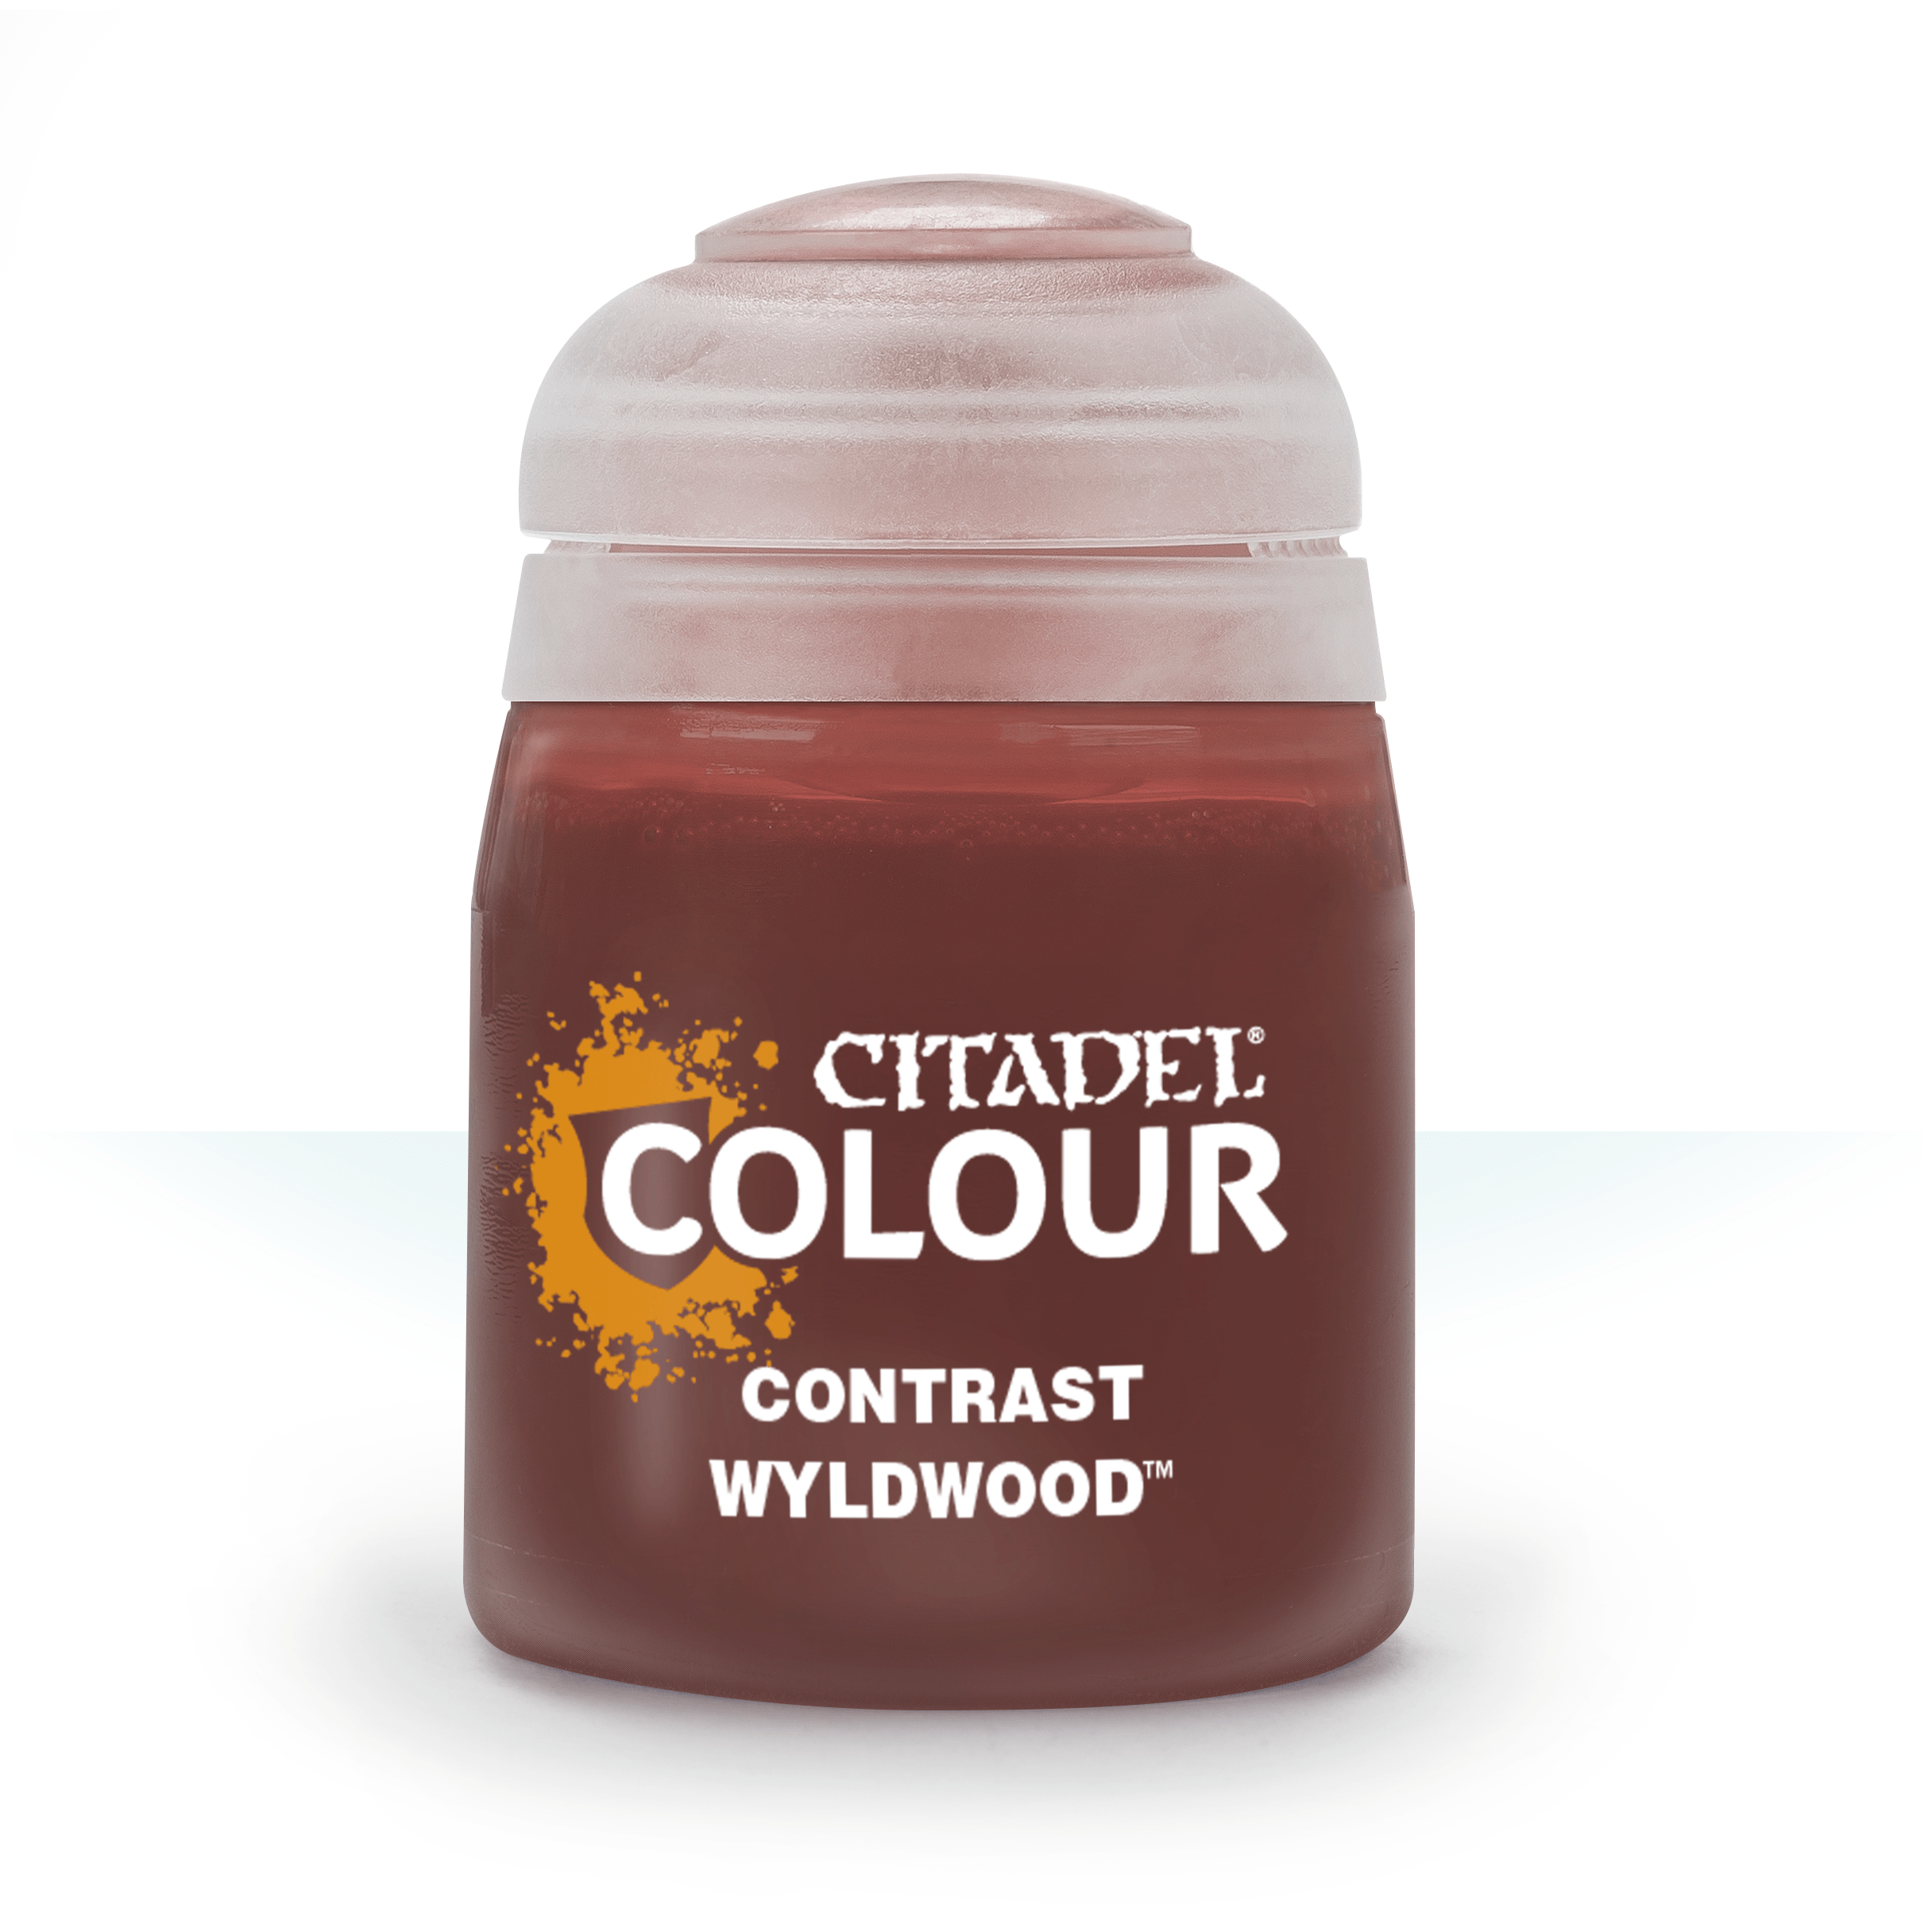 Citadel Contrast Paint: Wyldwood 29-30